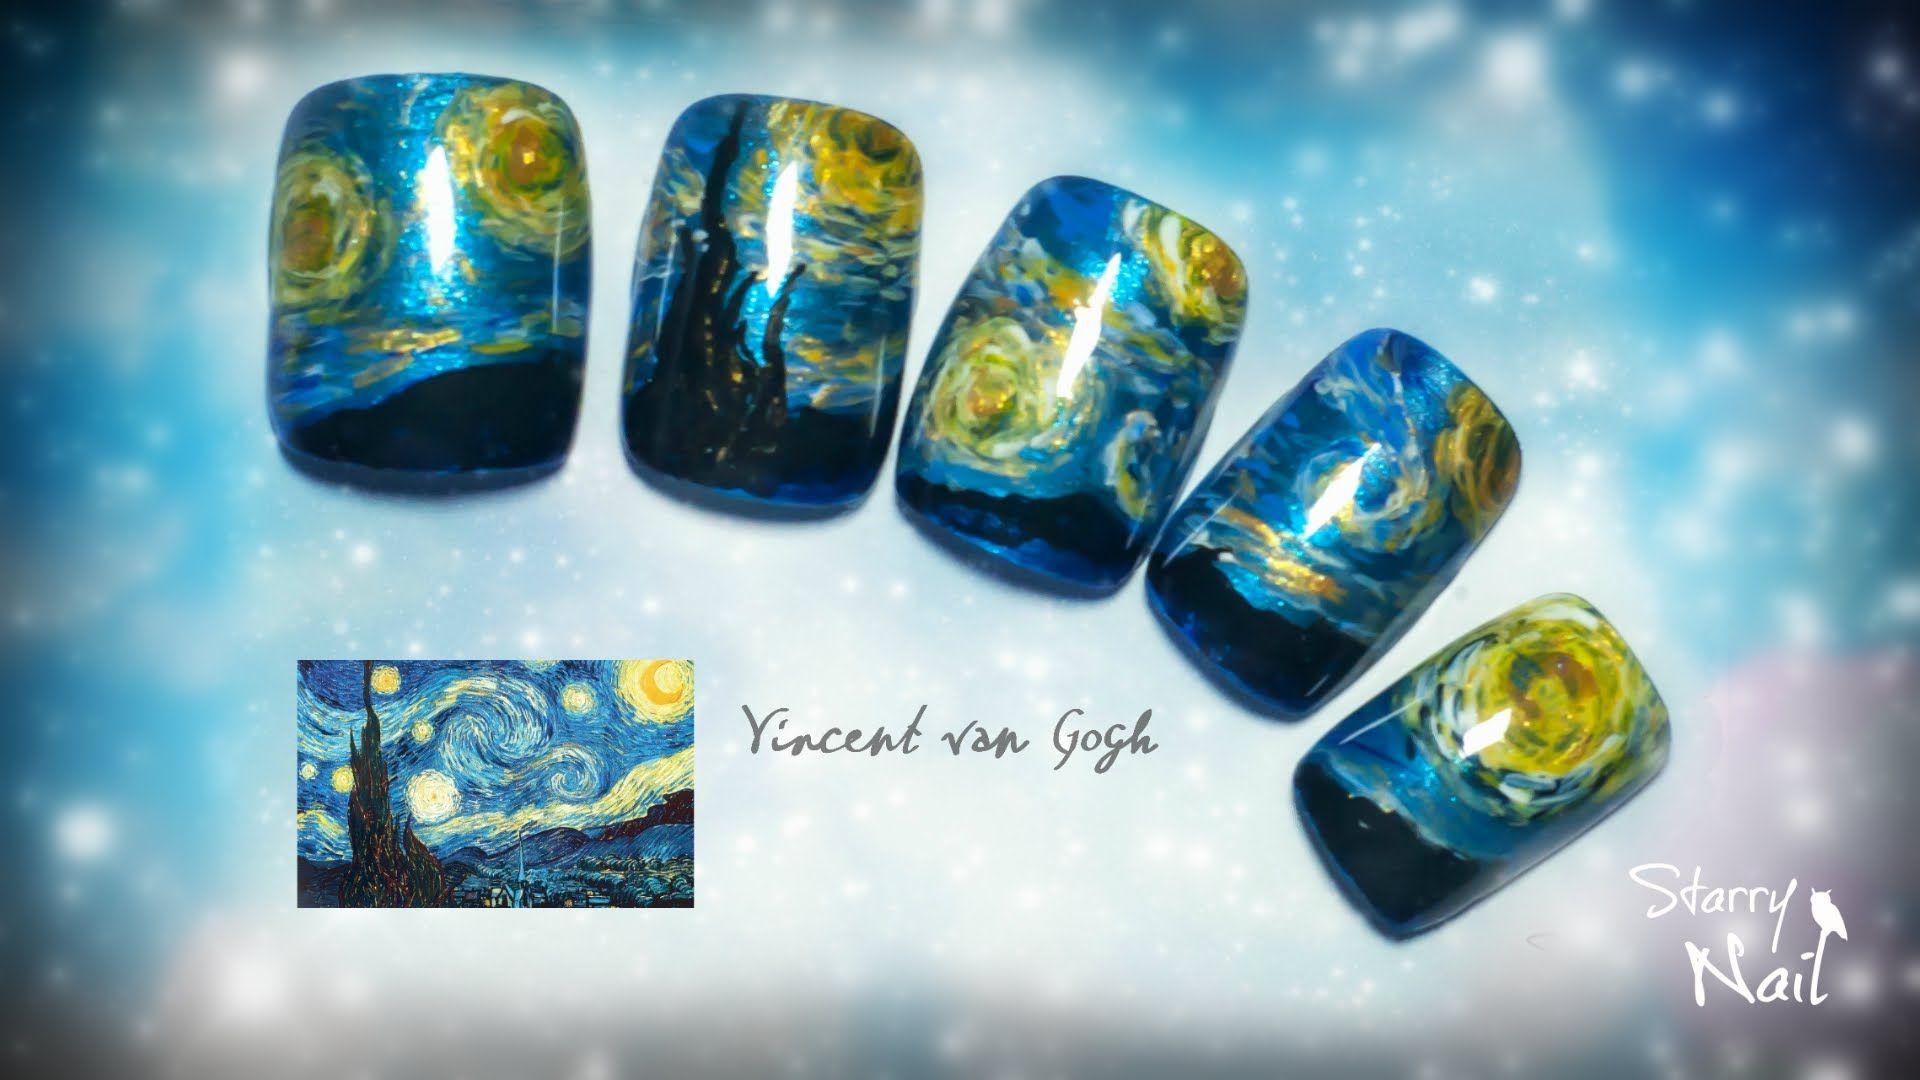 Vincent van Gogh Starry Night Nail Art Tutorial | Nail Art Community ...